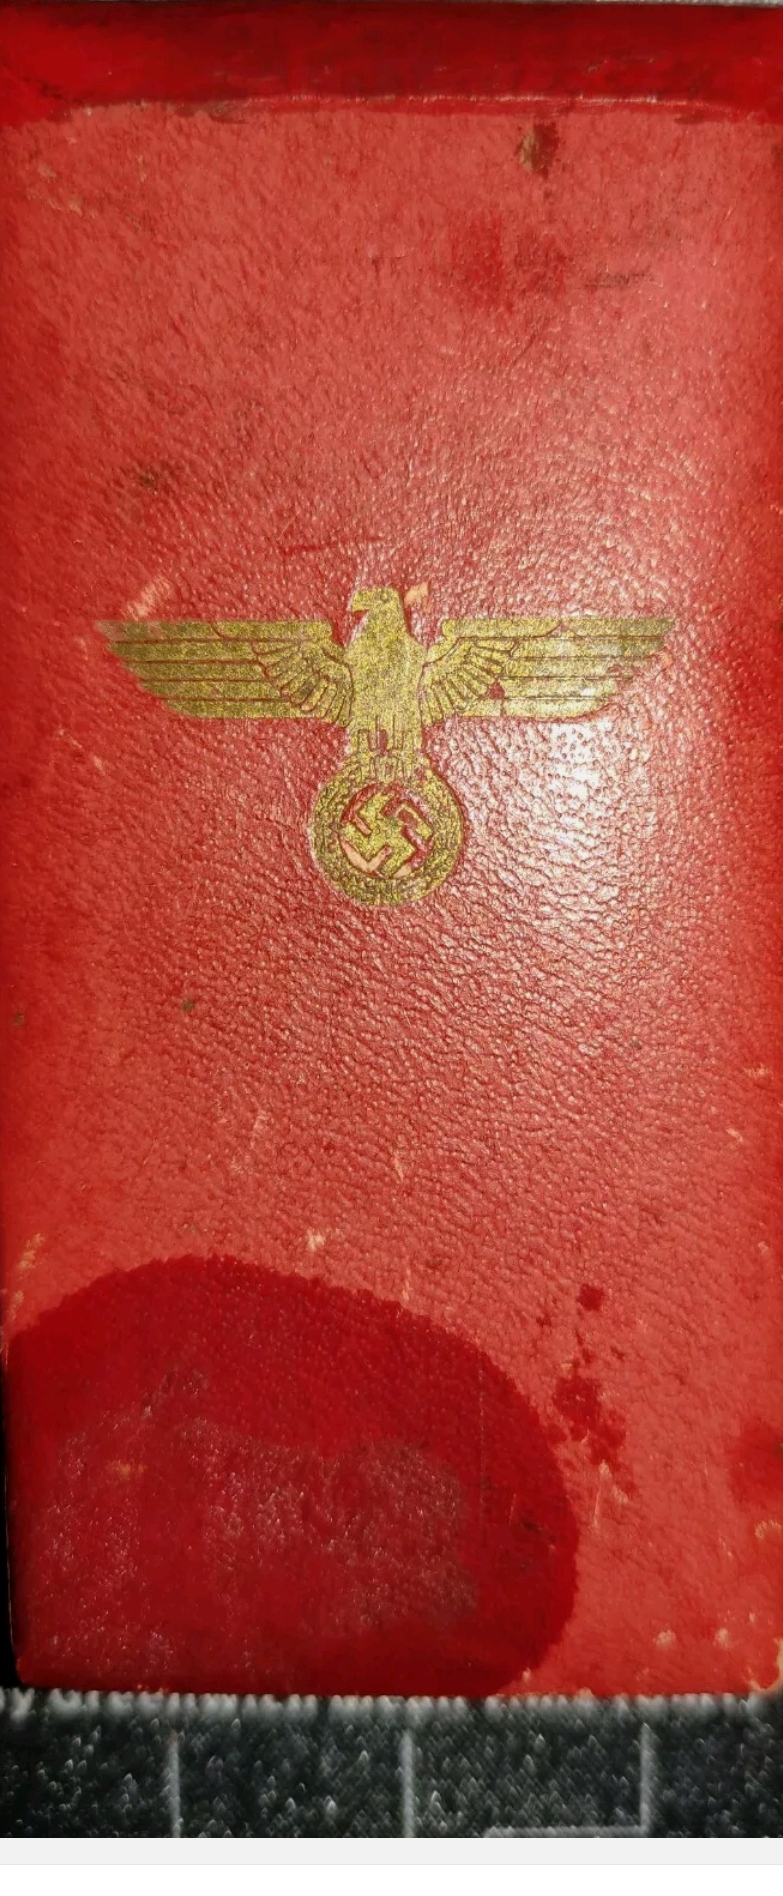 Avis Médaille Annexion Memel Img_2175